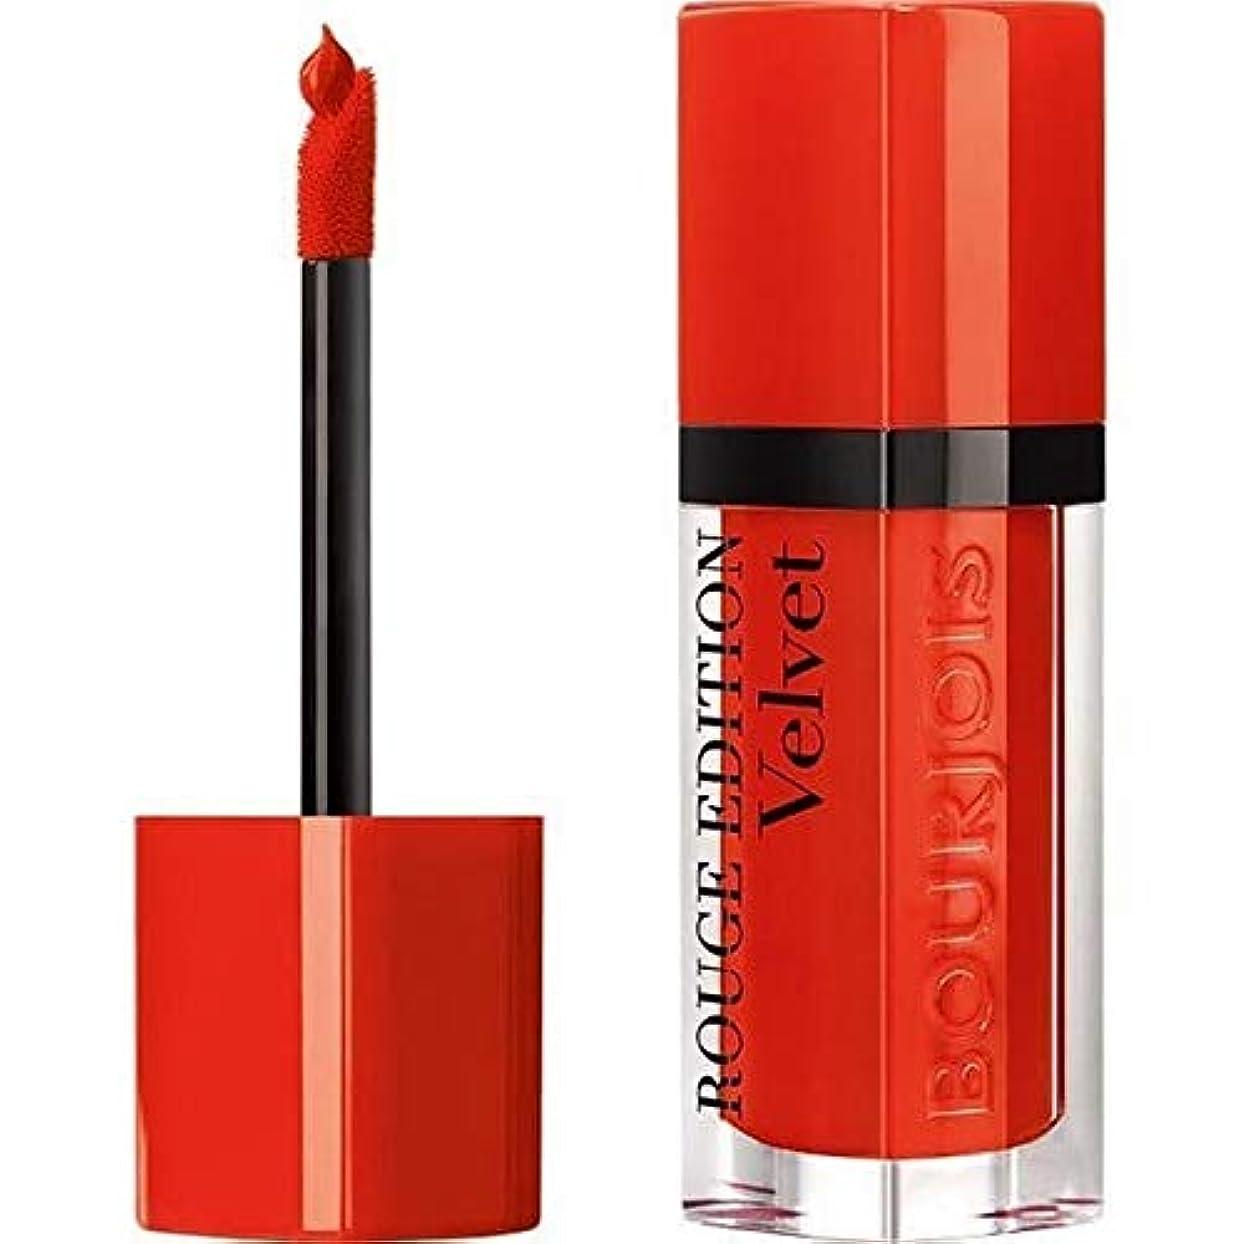 [Bourjois ] ブルジョワルージュ版のベルベットの口紅ケシの日20 - Bourjois Rouge Edition Velvet Lipstick Poppy Days 20 [並行輸入品]